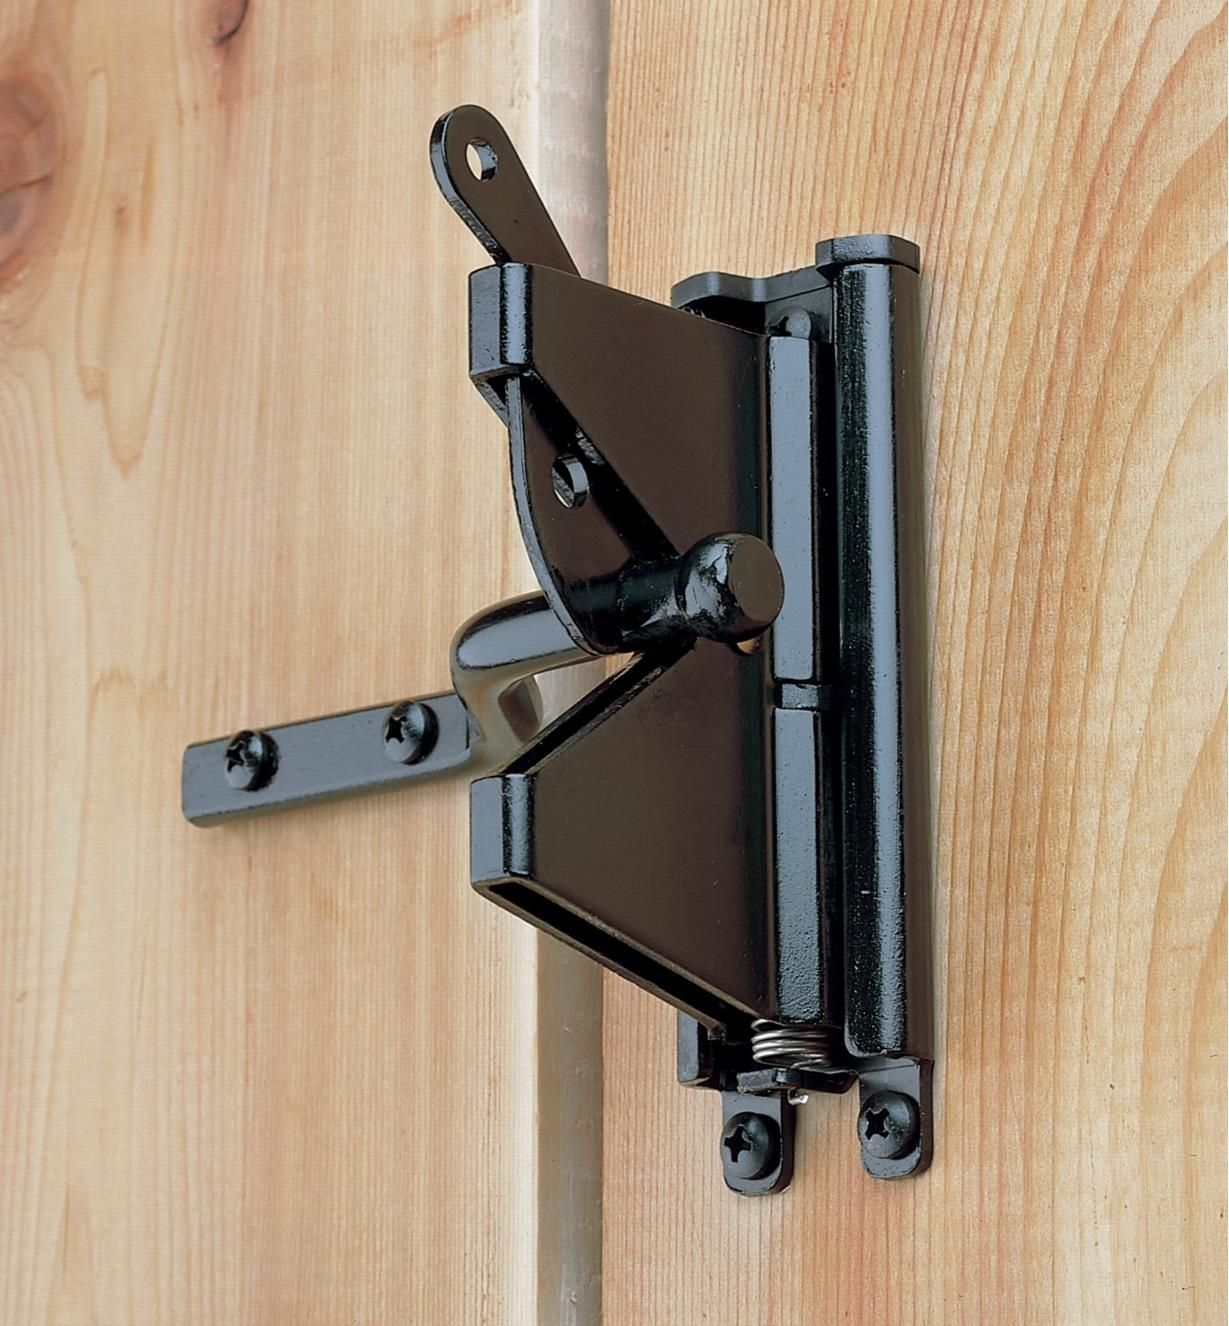 SelfAligning Gate Latch в 2020 г. Декор из железа